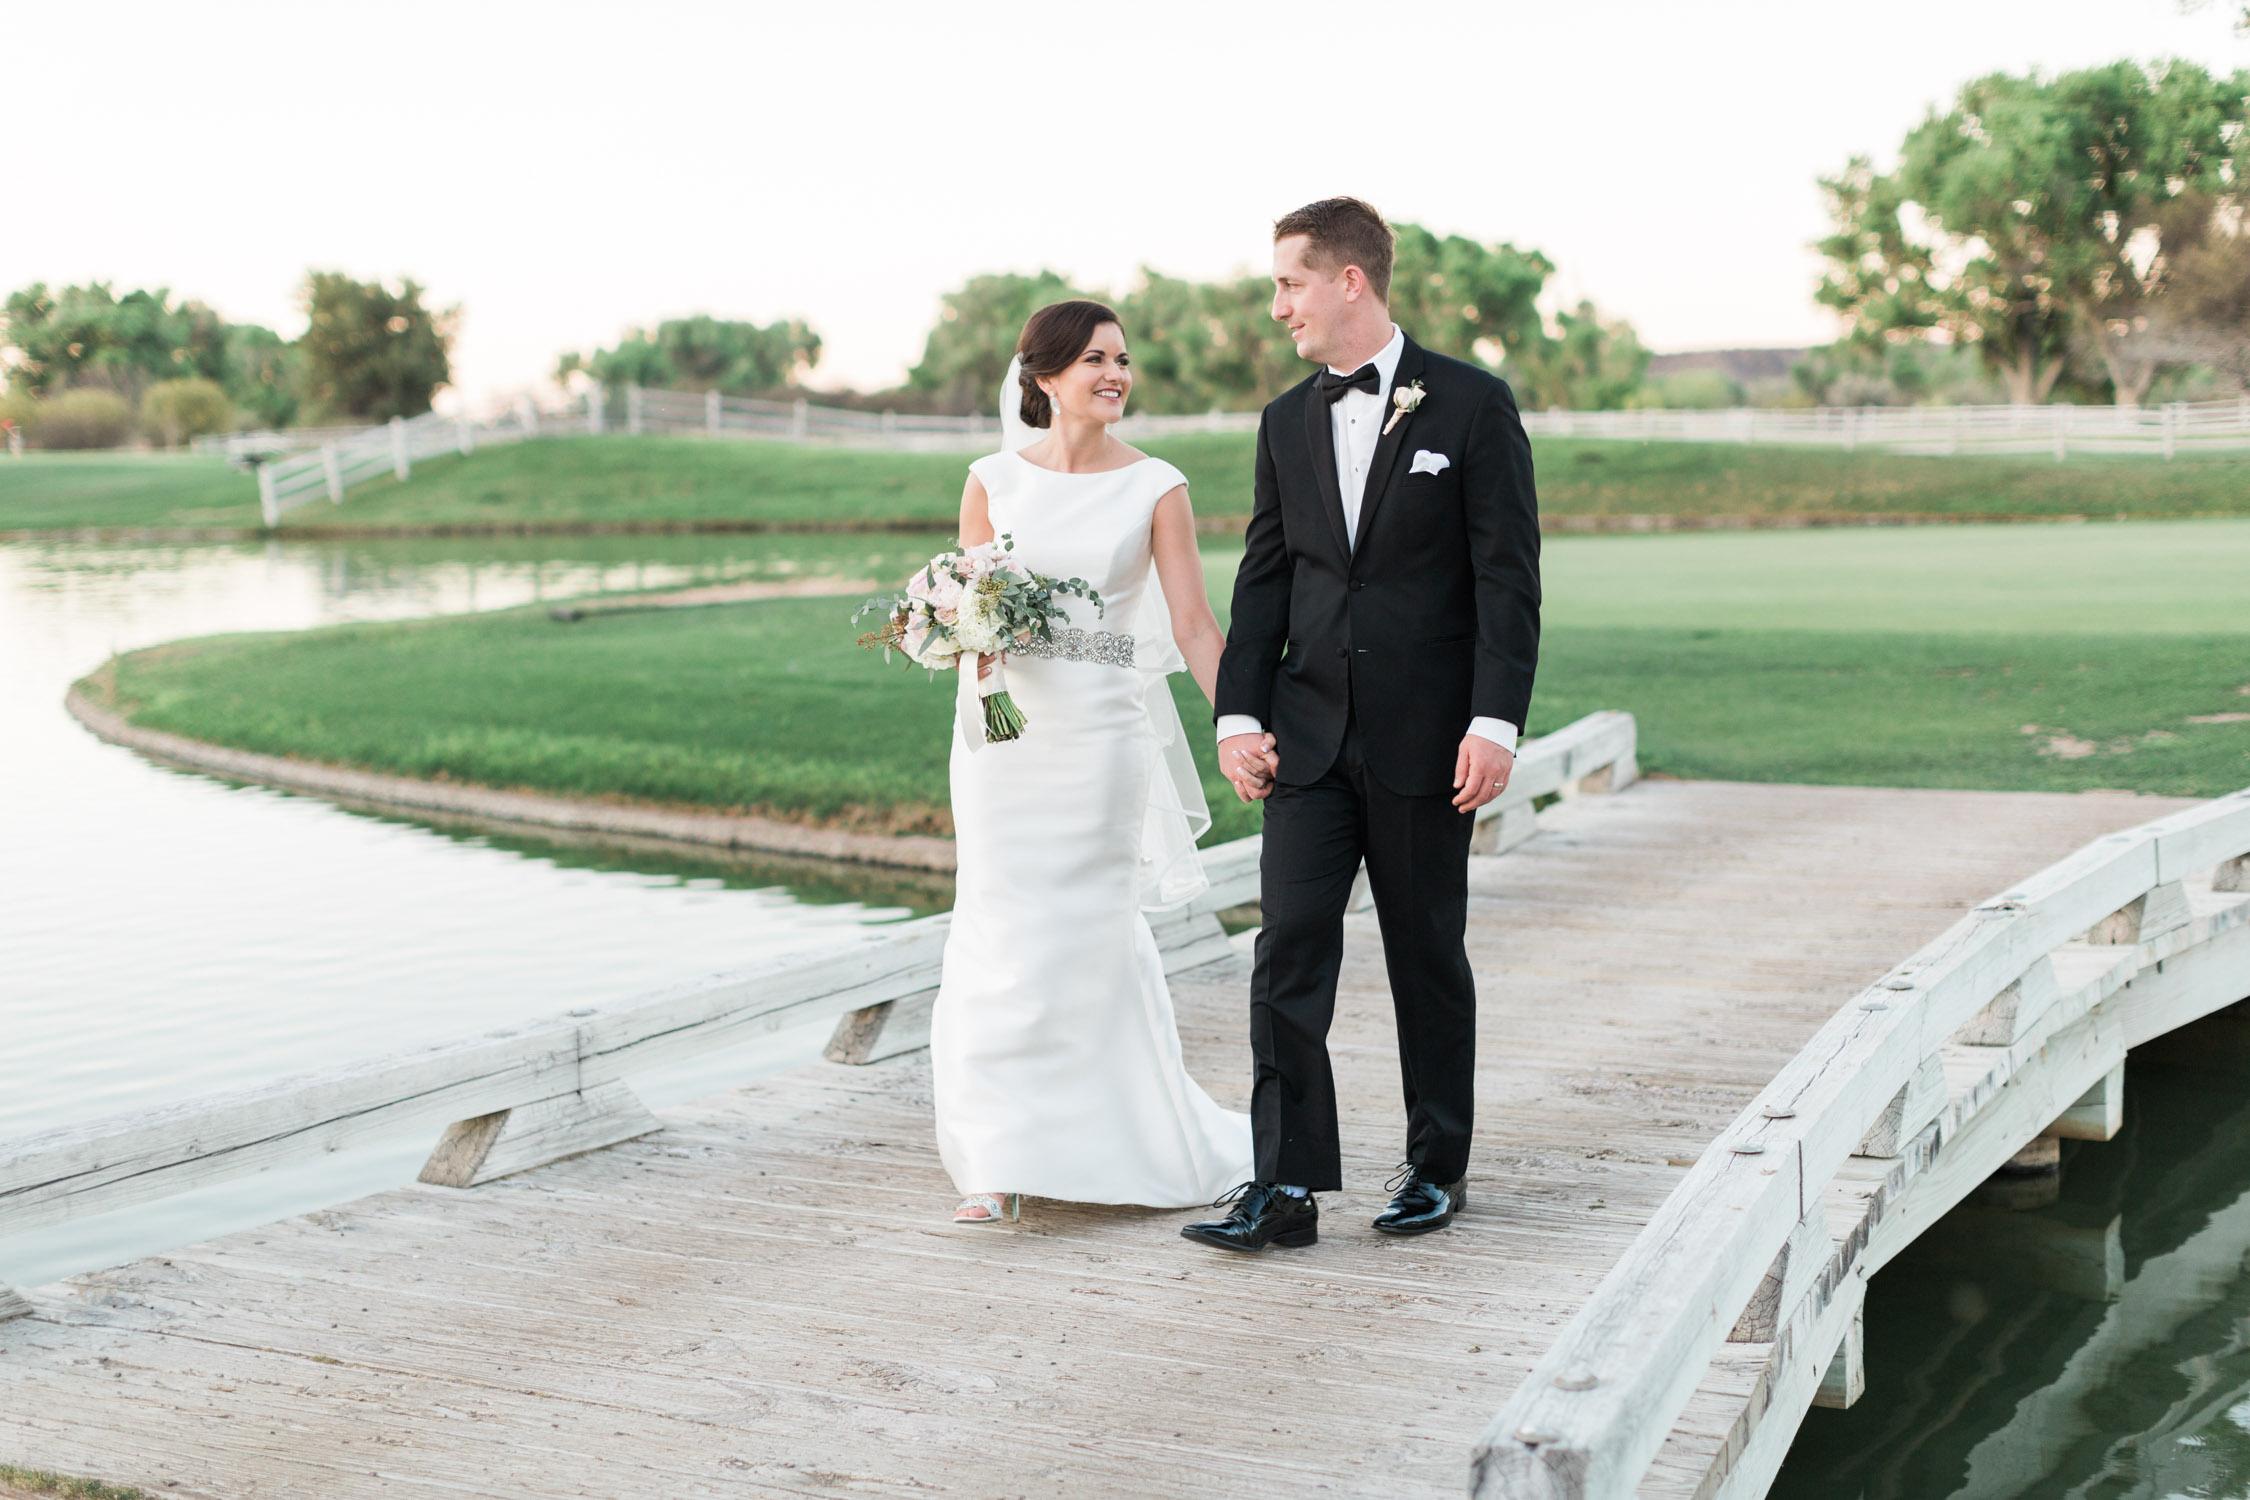 Walking across the bridge at wedding venue in Tubac